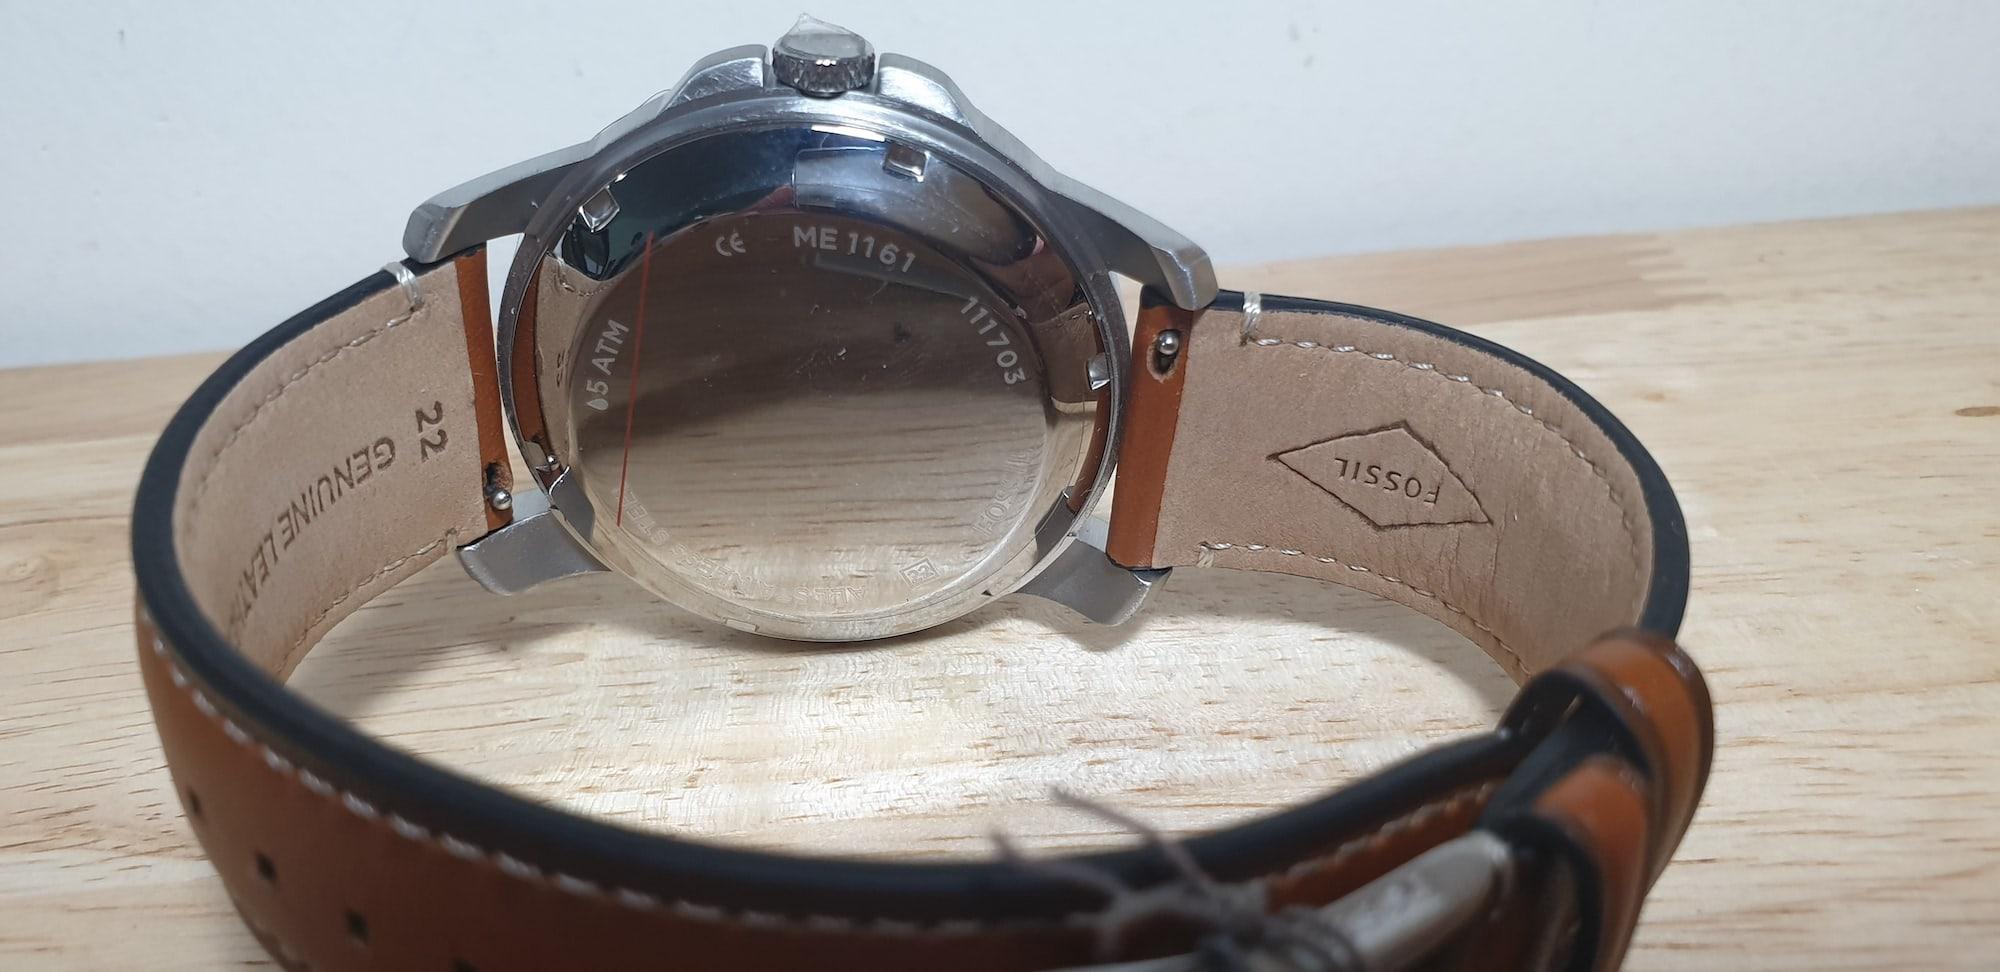 Đồng hồ máy cơ kết hợp máy pinFossil ME1161